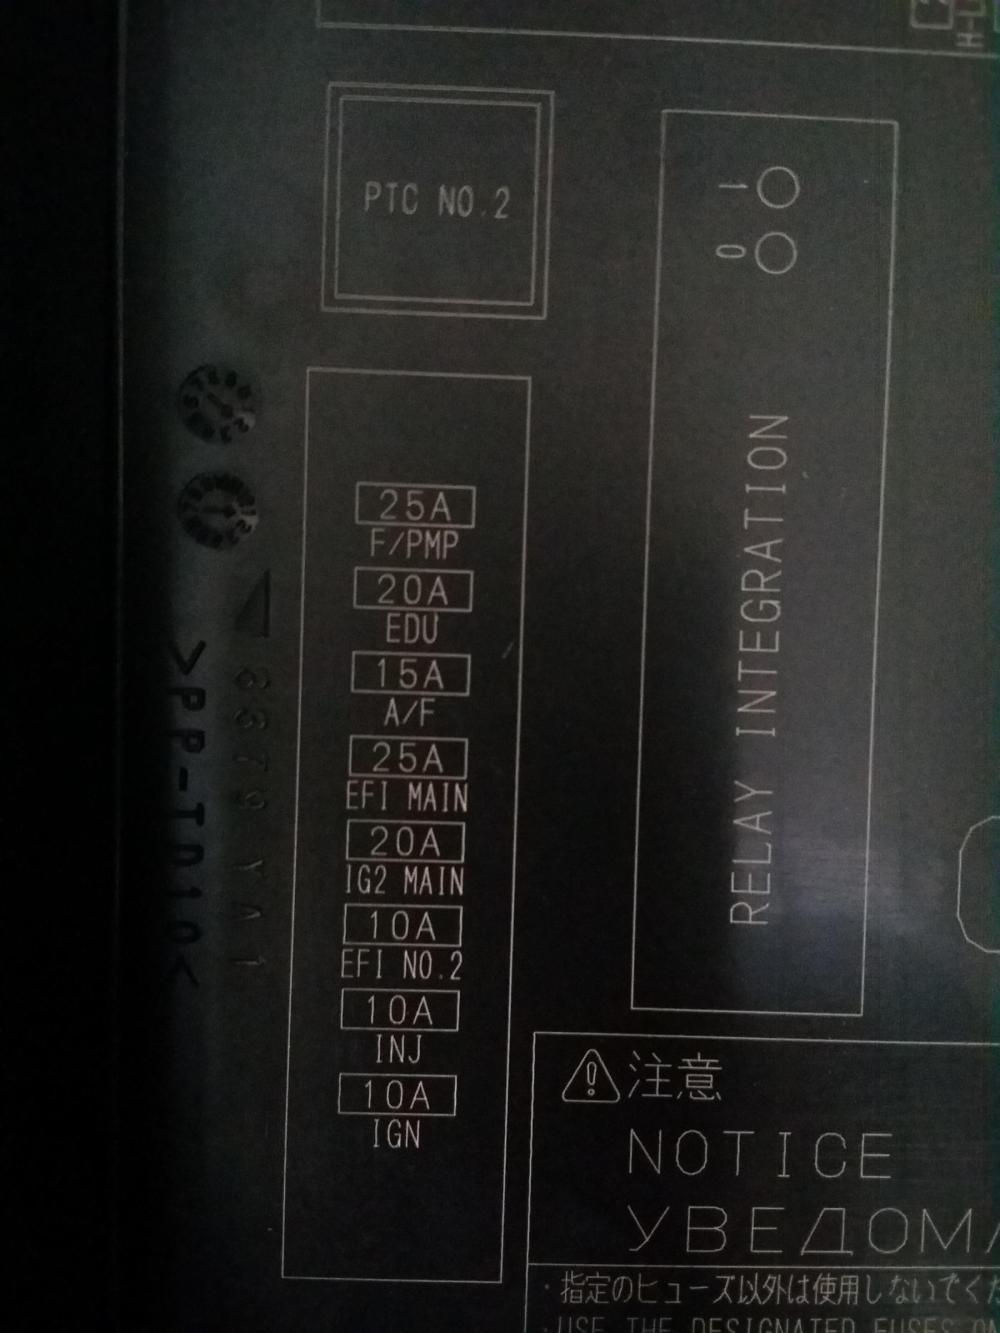 medium resolution of headlight wiring diagram 20131025 134510 jpg headlight wiring diagram 20131025 134633 jpg